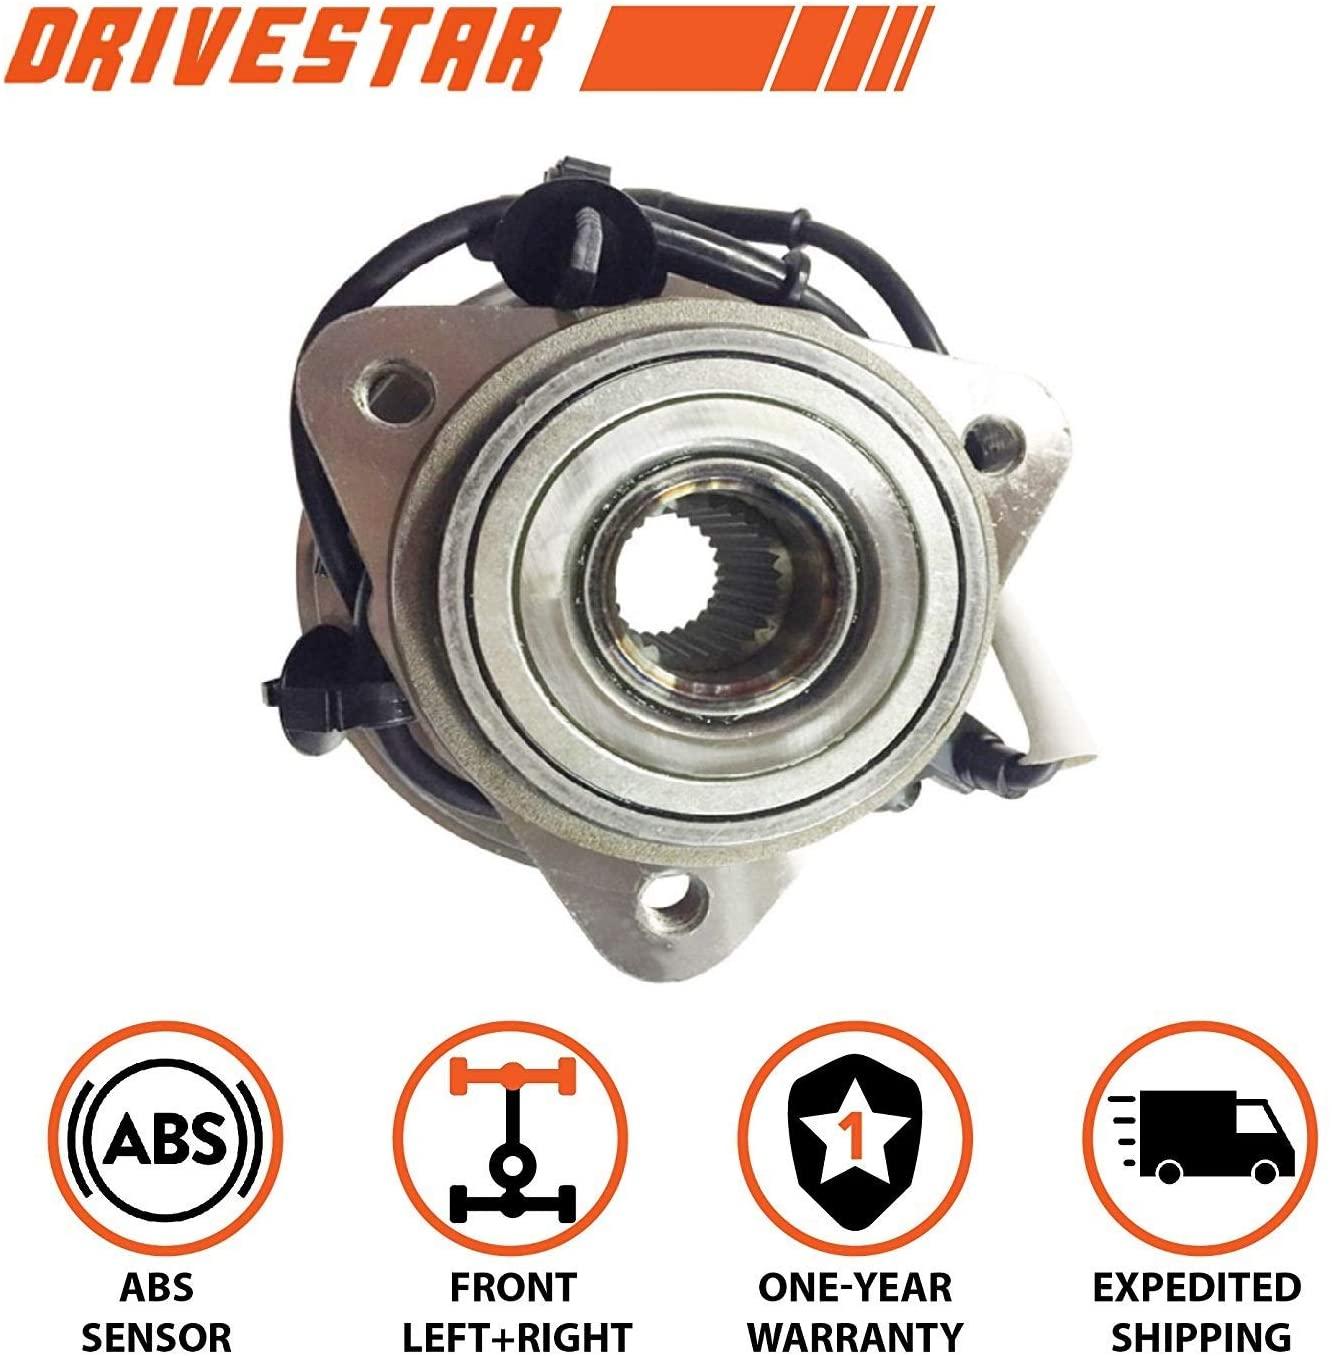 DRIVESTAR 515003 Front Wheel Hub & Bearing Assembly for Selected Ford Explorer/Ranger, Mazda B4000/B3000, Mercury Mountaineer 4WD, 5 Lug w/ABS 3 Flange Bolt